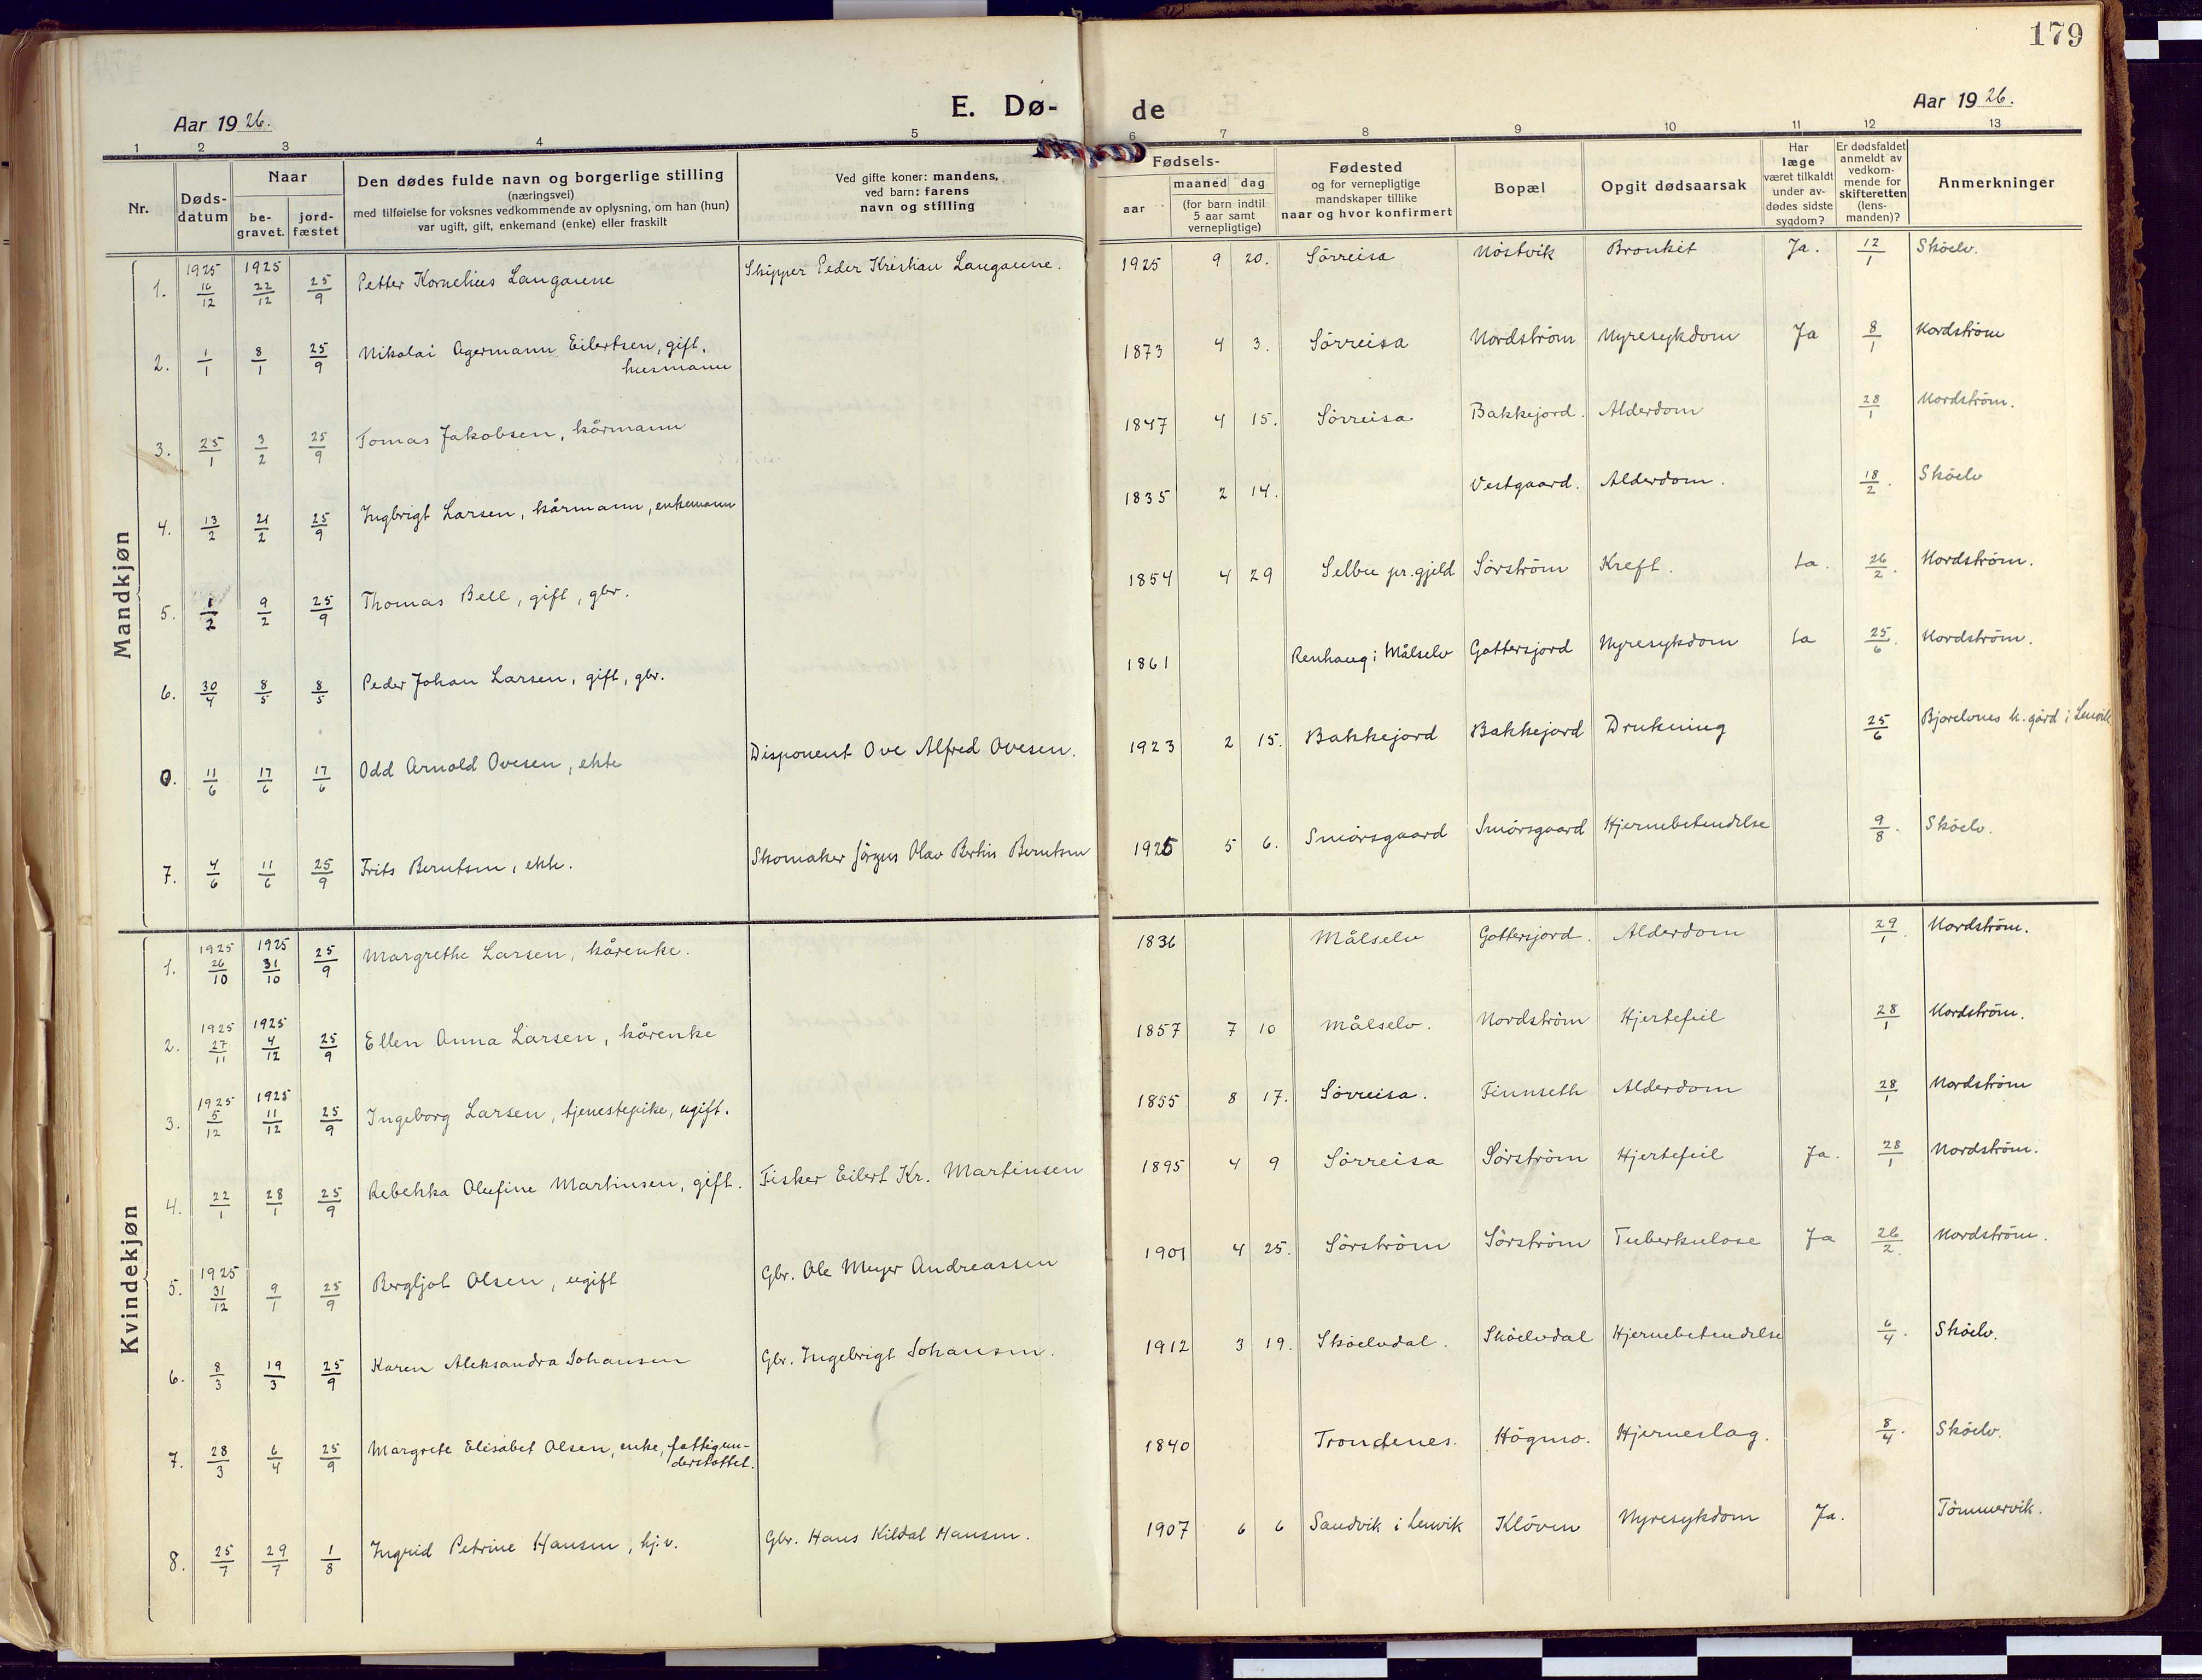 SATØ, Tranøy sokneprestkontor, I/Ia/Iaa/L0015kirke: Ministerialbok nr. 15, 1919-1928, s. 179